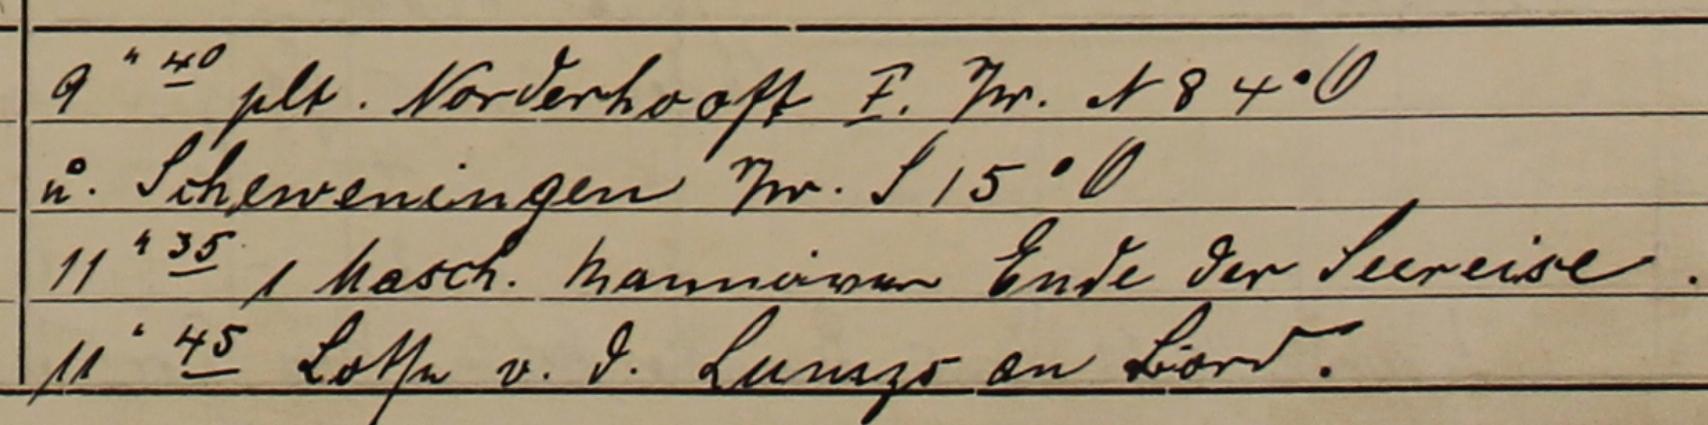 Logbuch Neumünster 1914